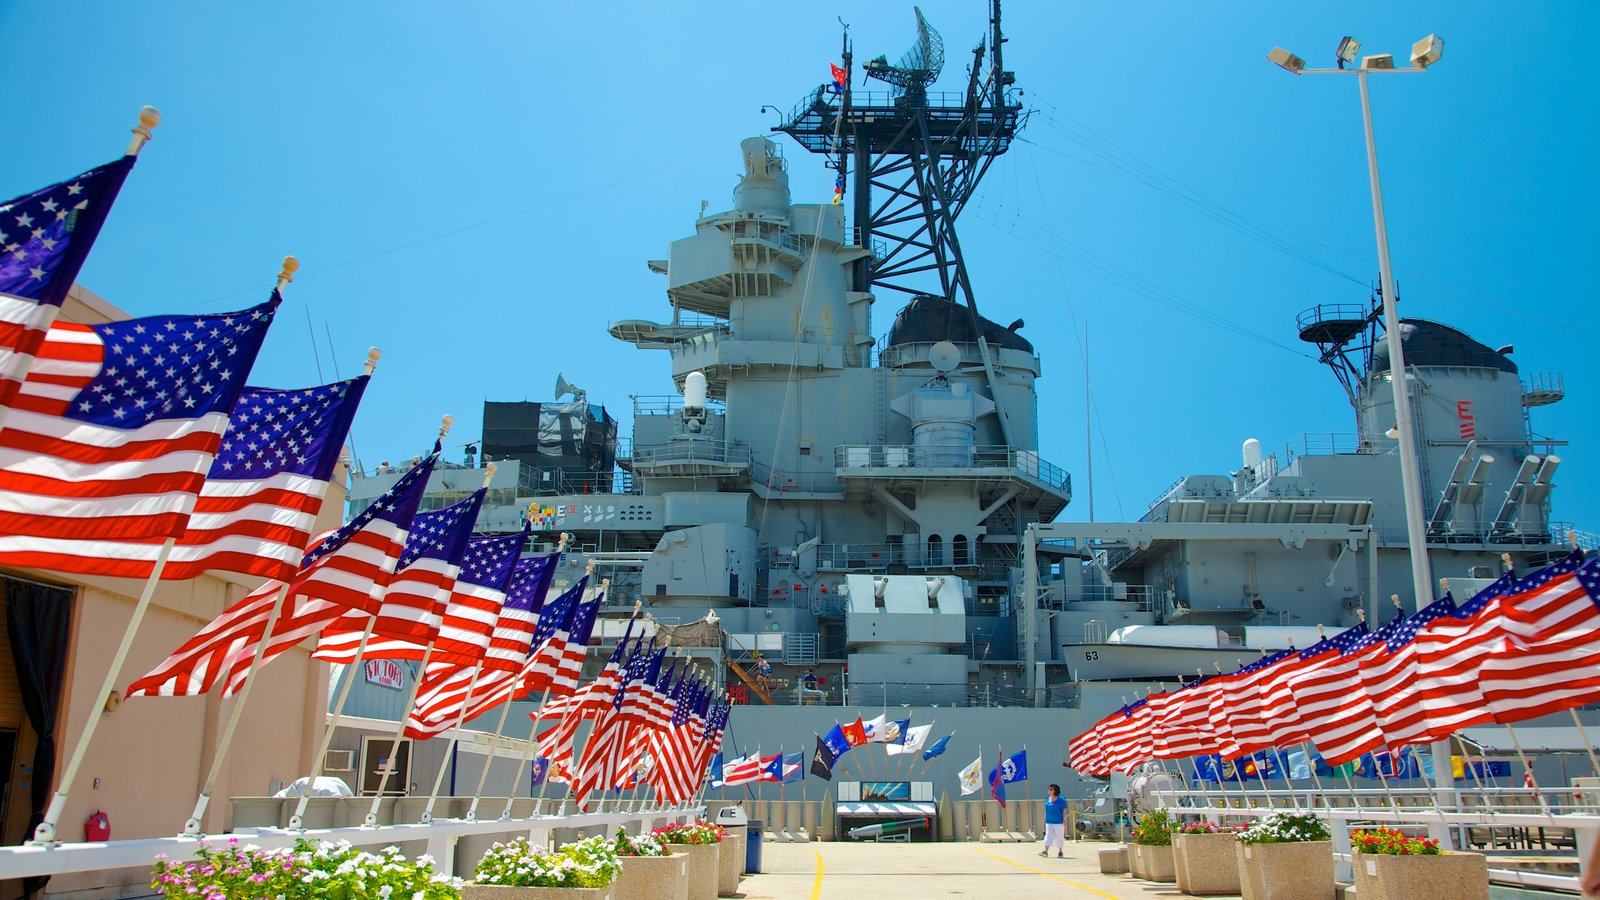 USS Missouri Memorial featuring military items